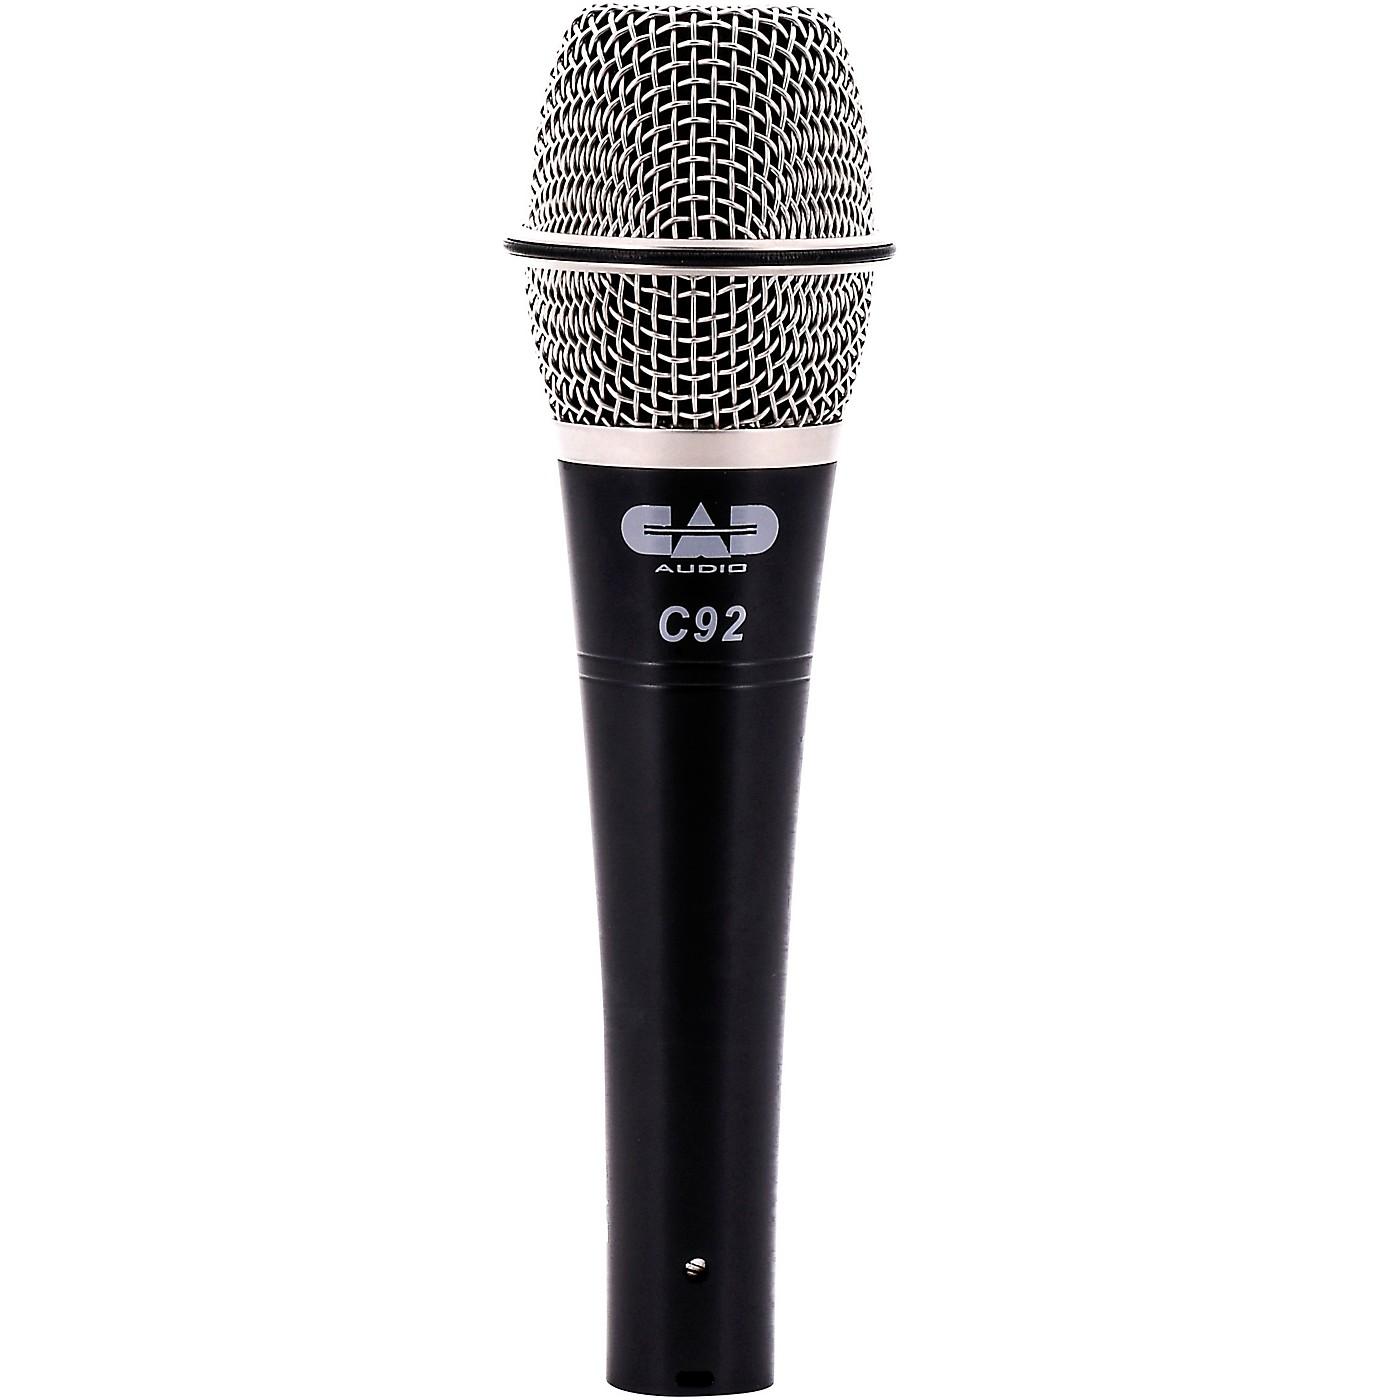 CAD C92 CADLive Premium Cardioid Condenser Handheld Microphone thumbnail